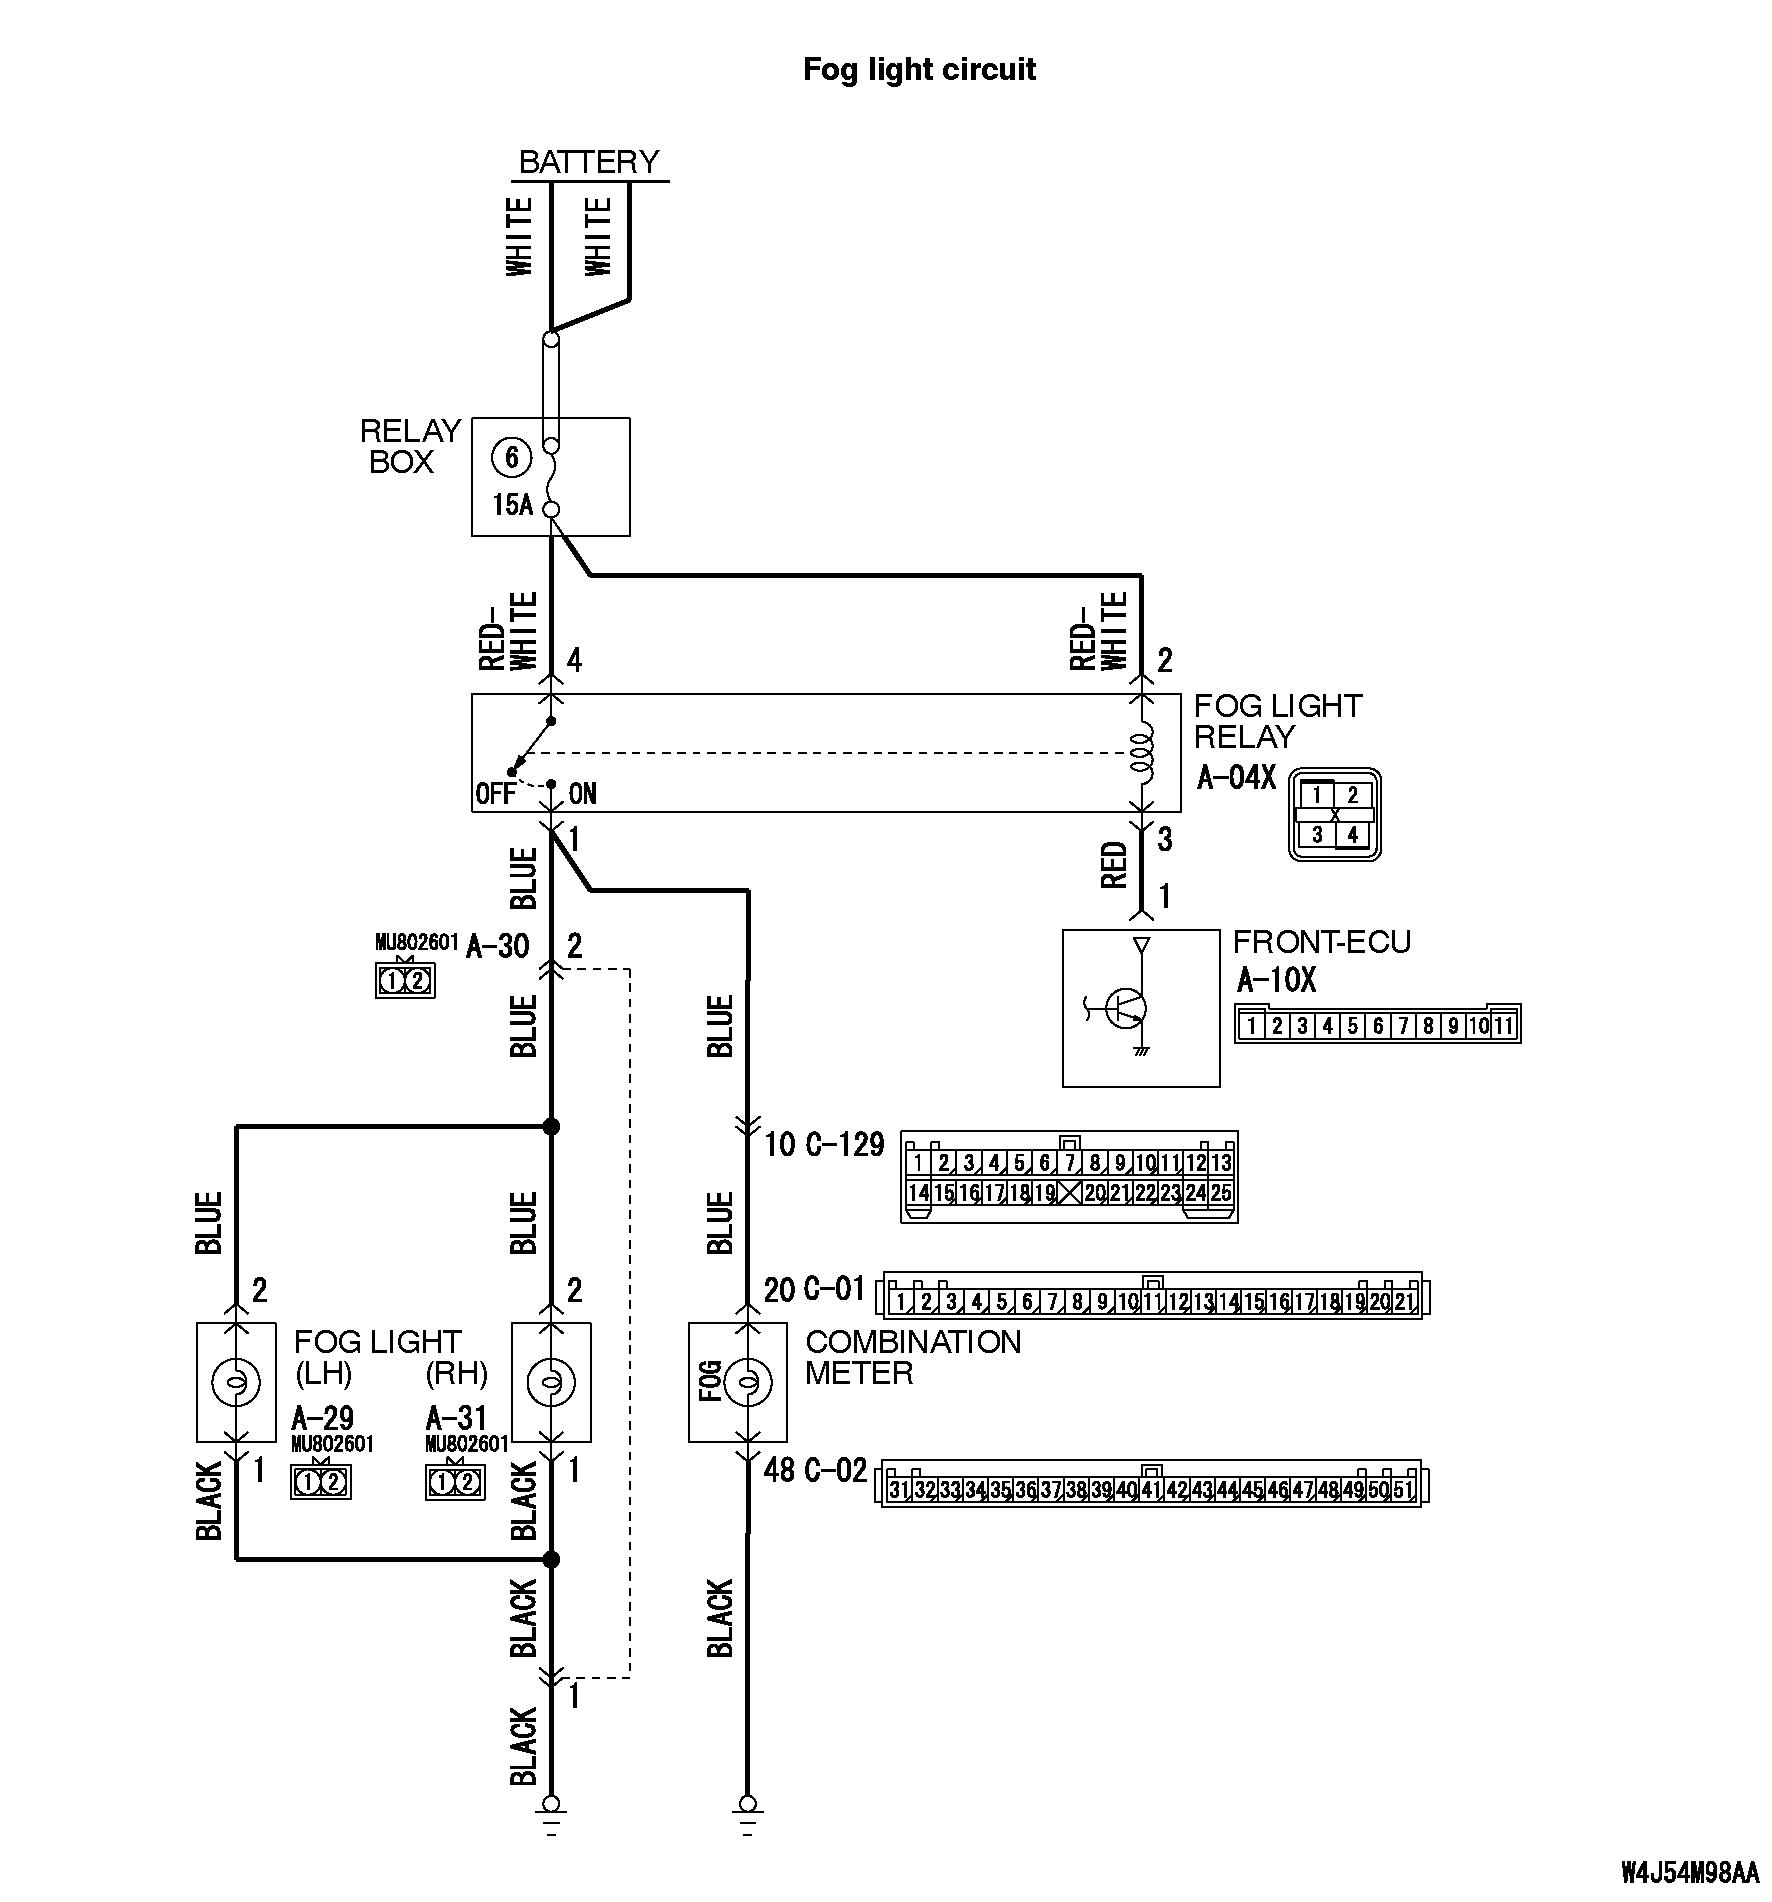 95405d1156140537 ralliart stock fog light wiring diagram m2285404_00330?resize\\\\\\\\\\\\\\\\\\\\\\\=665%2C714 loanplus cms wiring diagrams gandul 45 77 79 119  at readyjetset.co